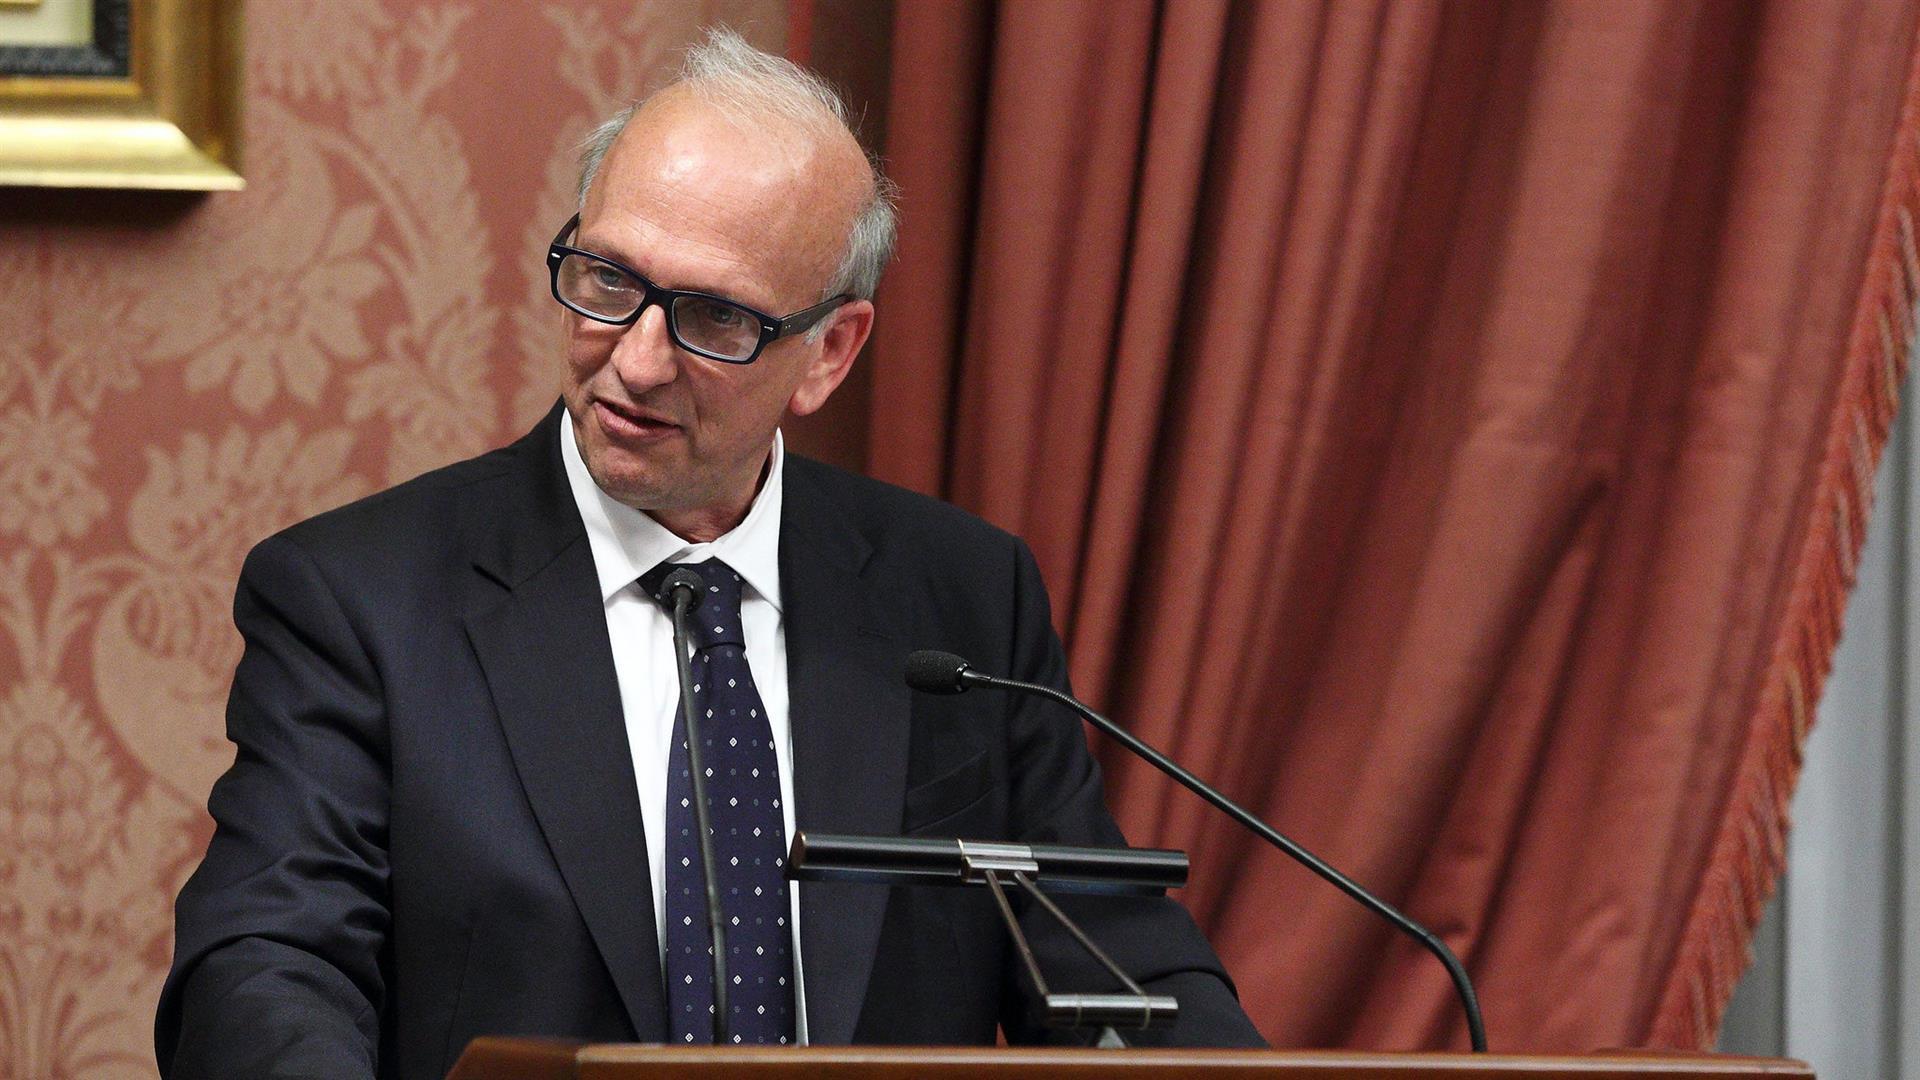 Diplomi falsi, Bussetti manda ispettori in scuole paritarie